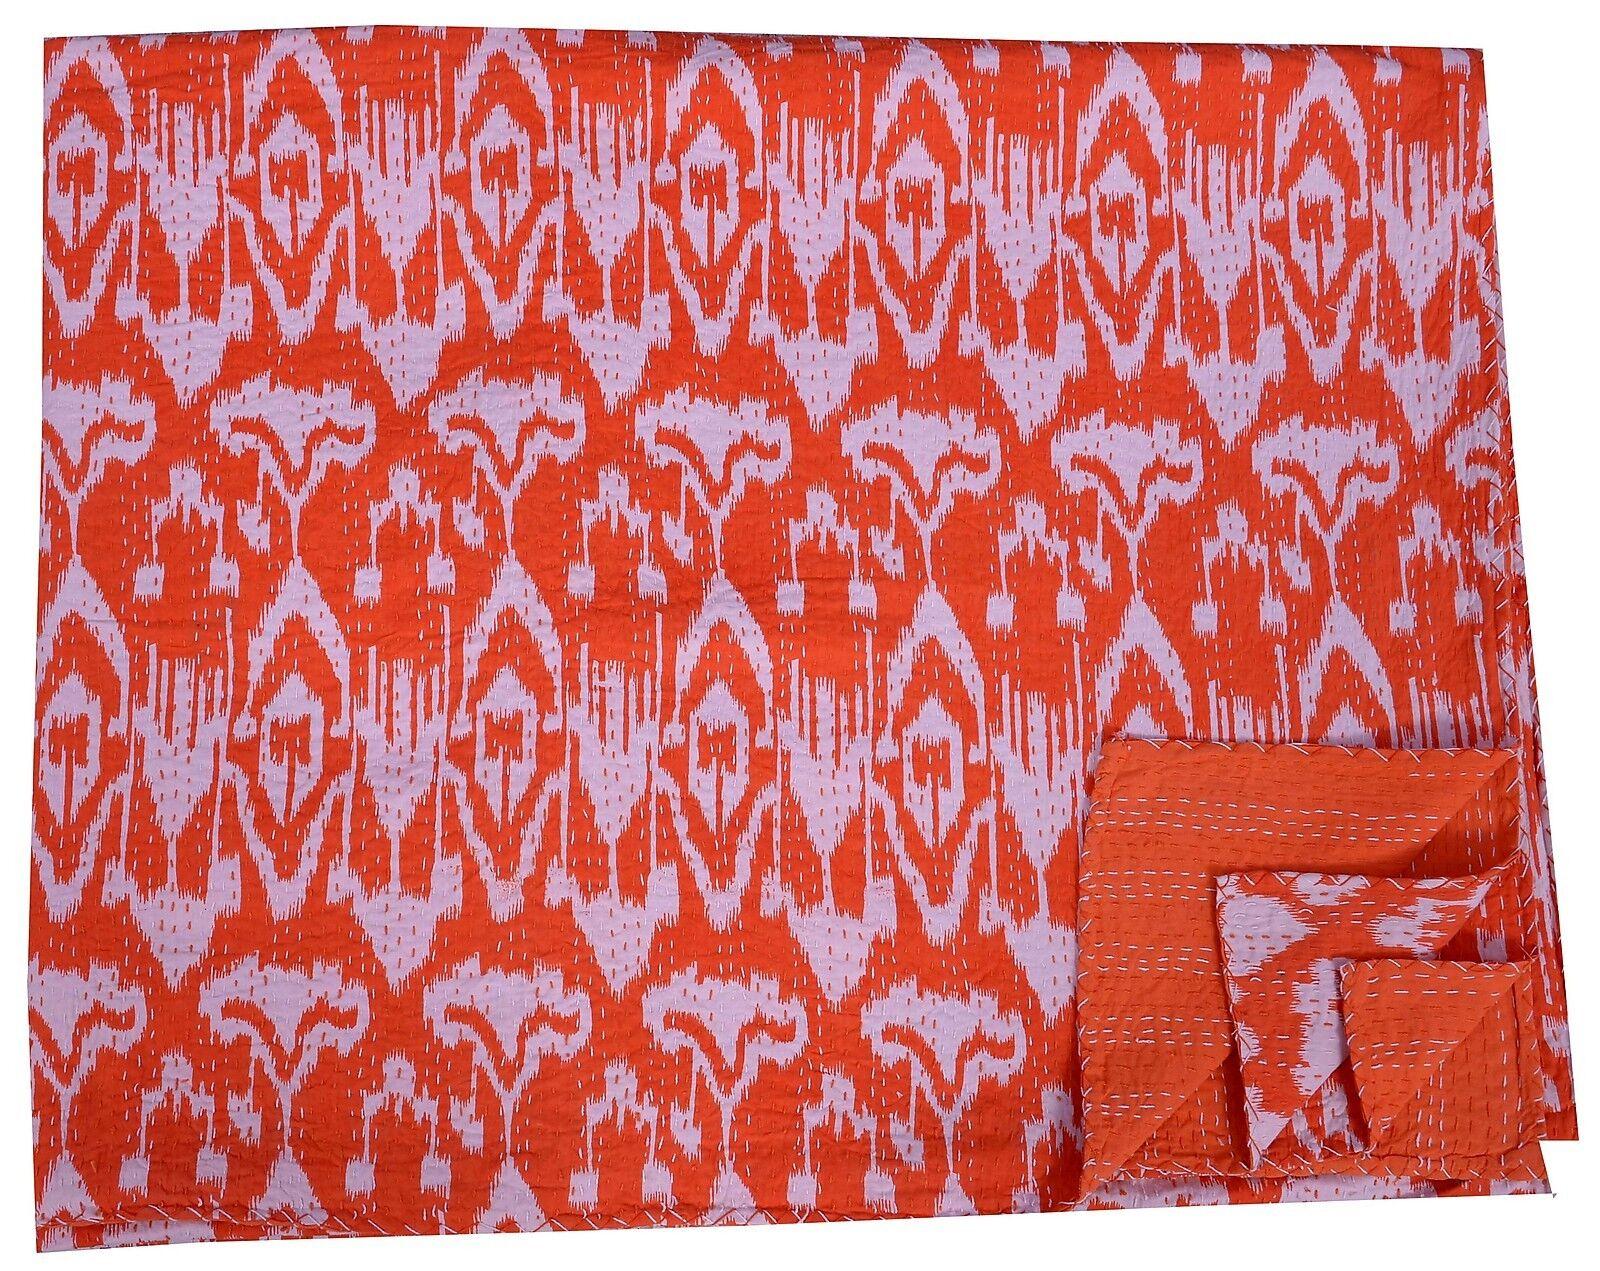 Indian Handmade Queen Kantha Quilt Cotton Bedspread Reversible Blanket Throw